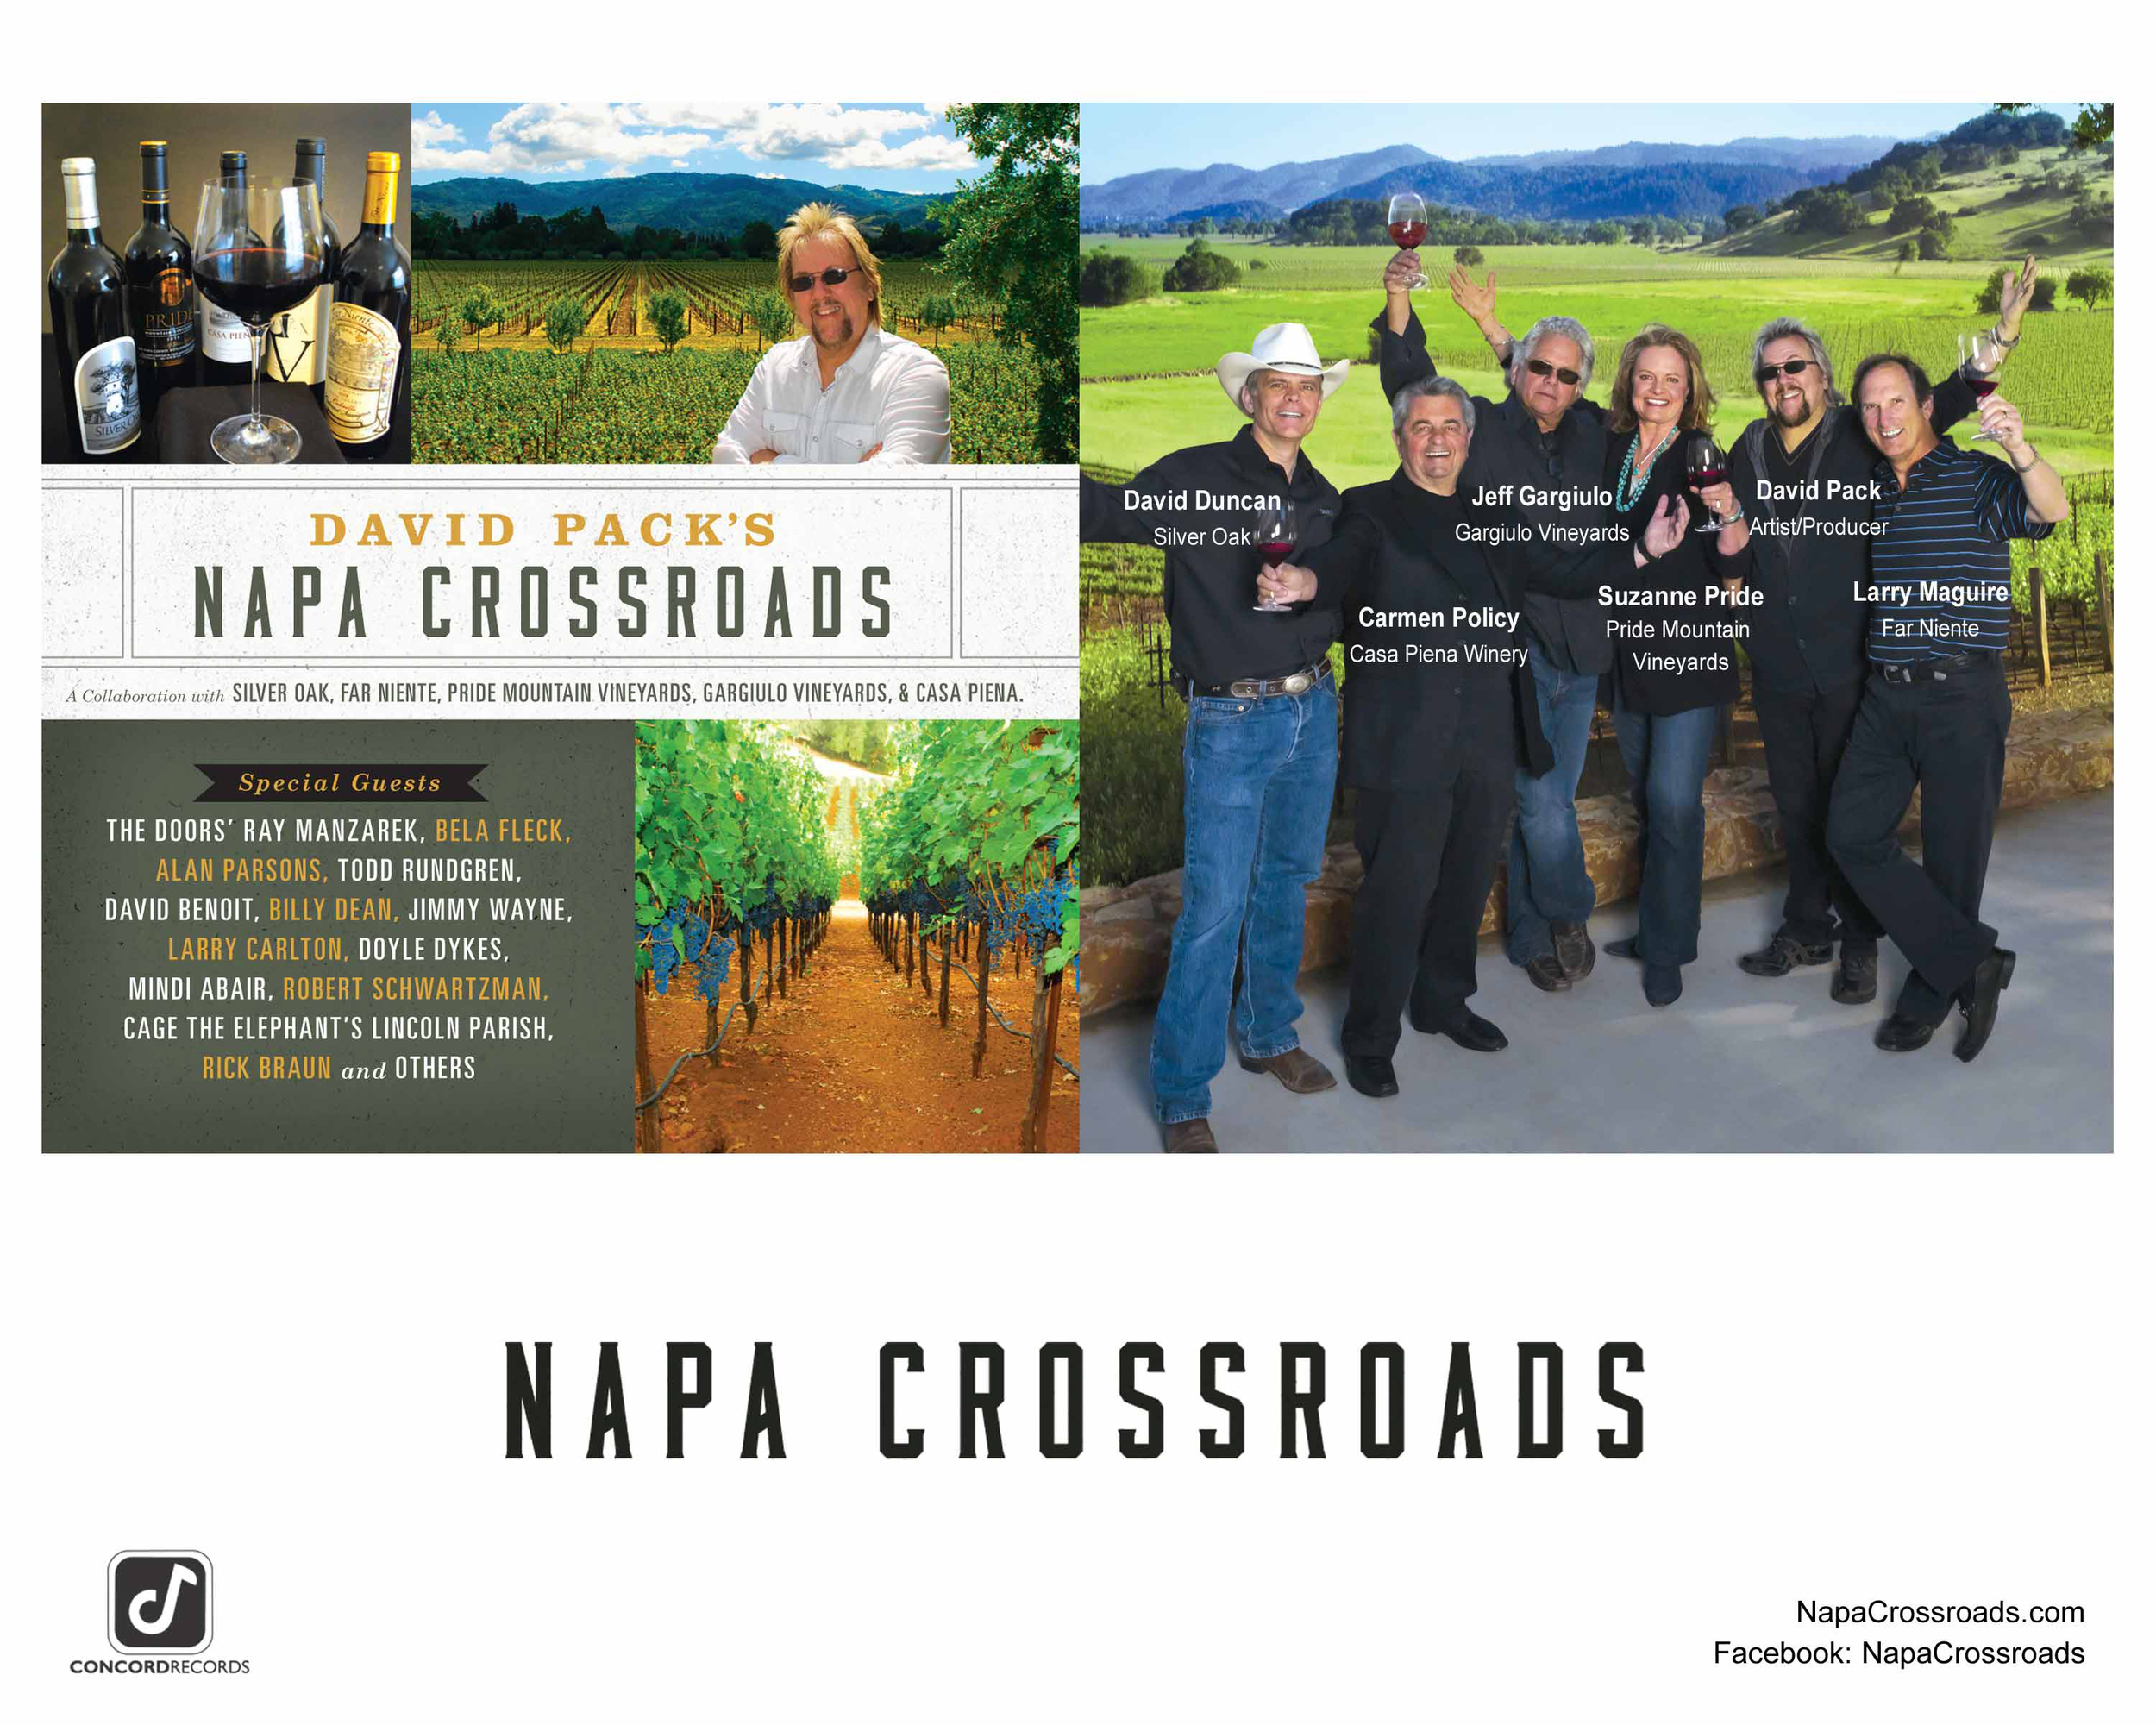 8x10-Photo-Napa-Crossroads-2-David-Pack.jpg